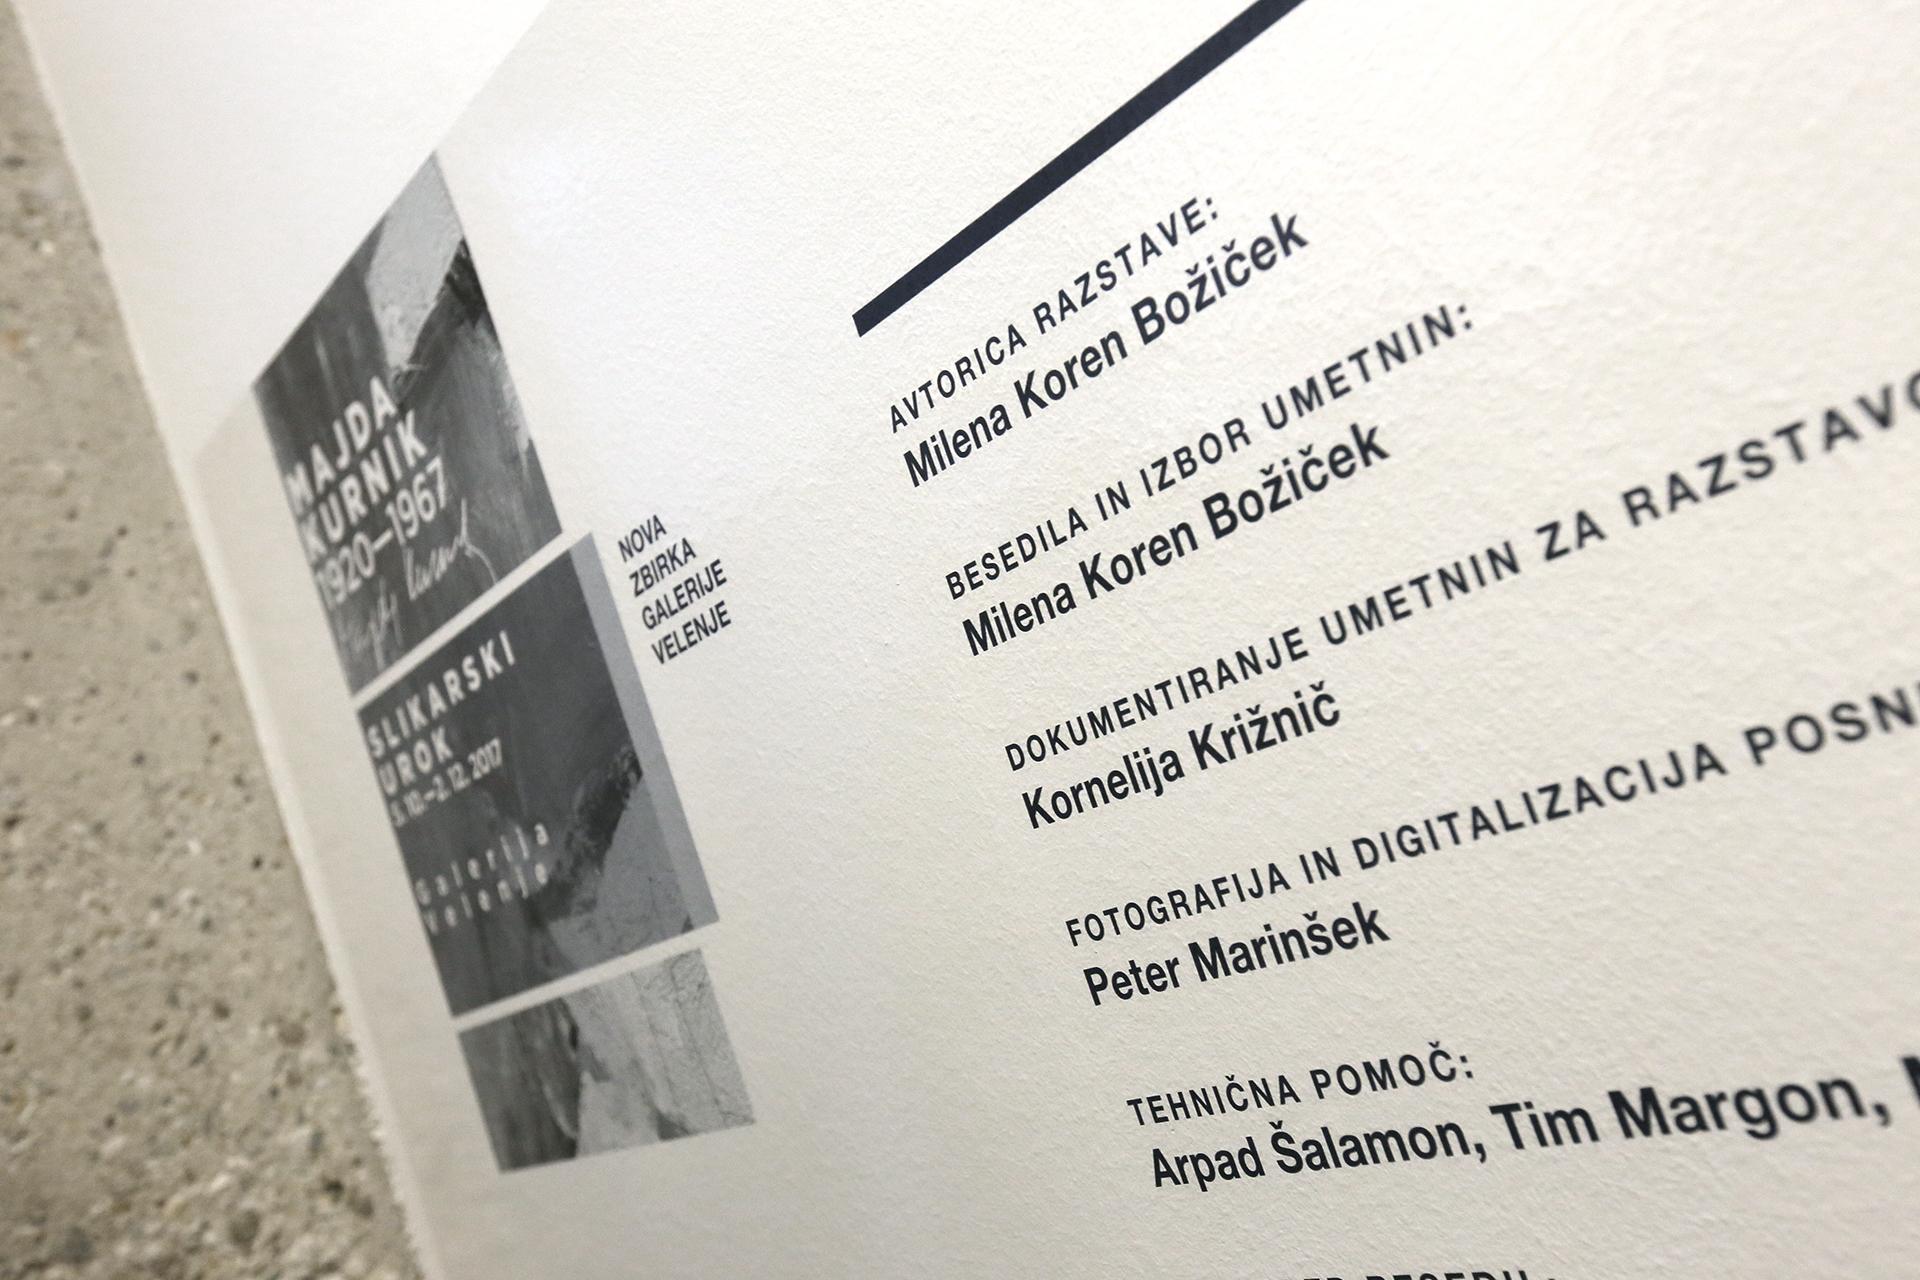 razstava_kurnik_ma-ma_marko_marinsek6